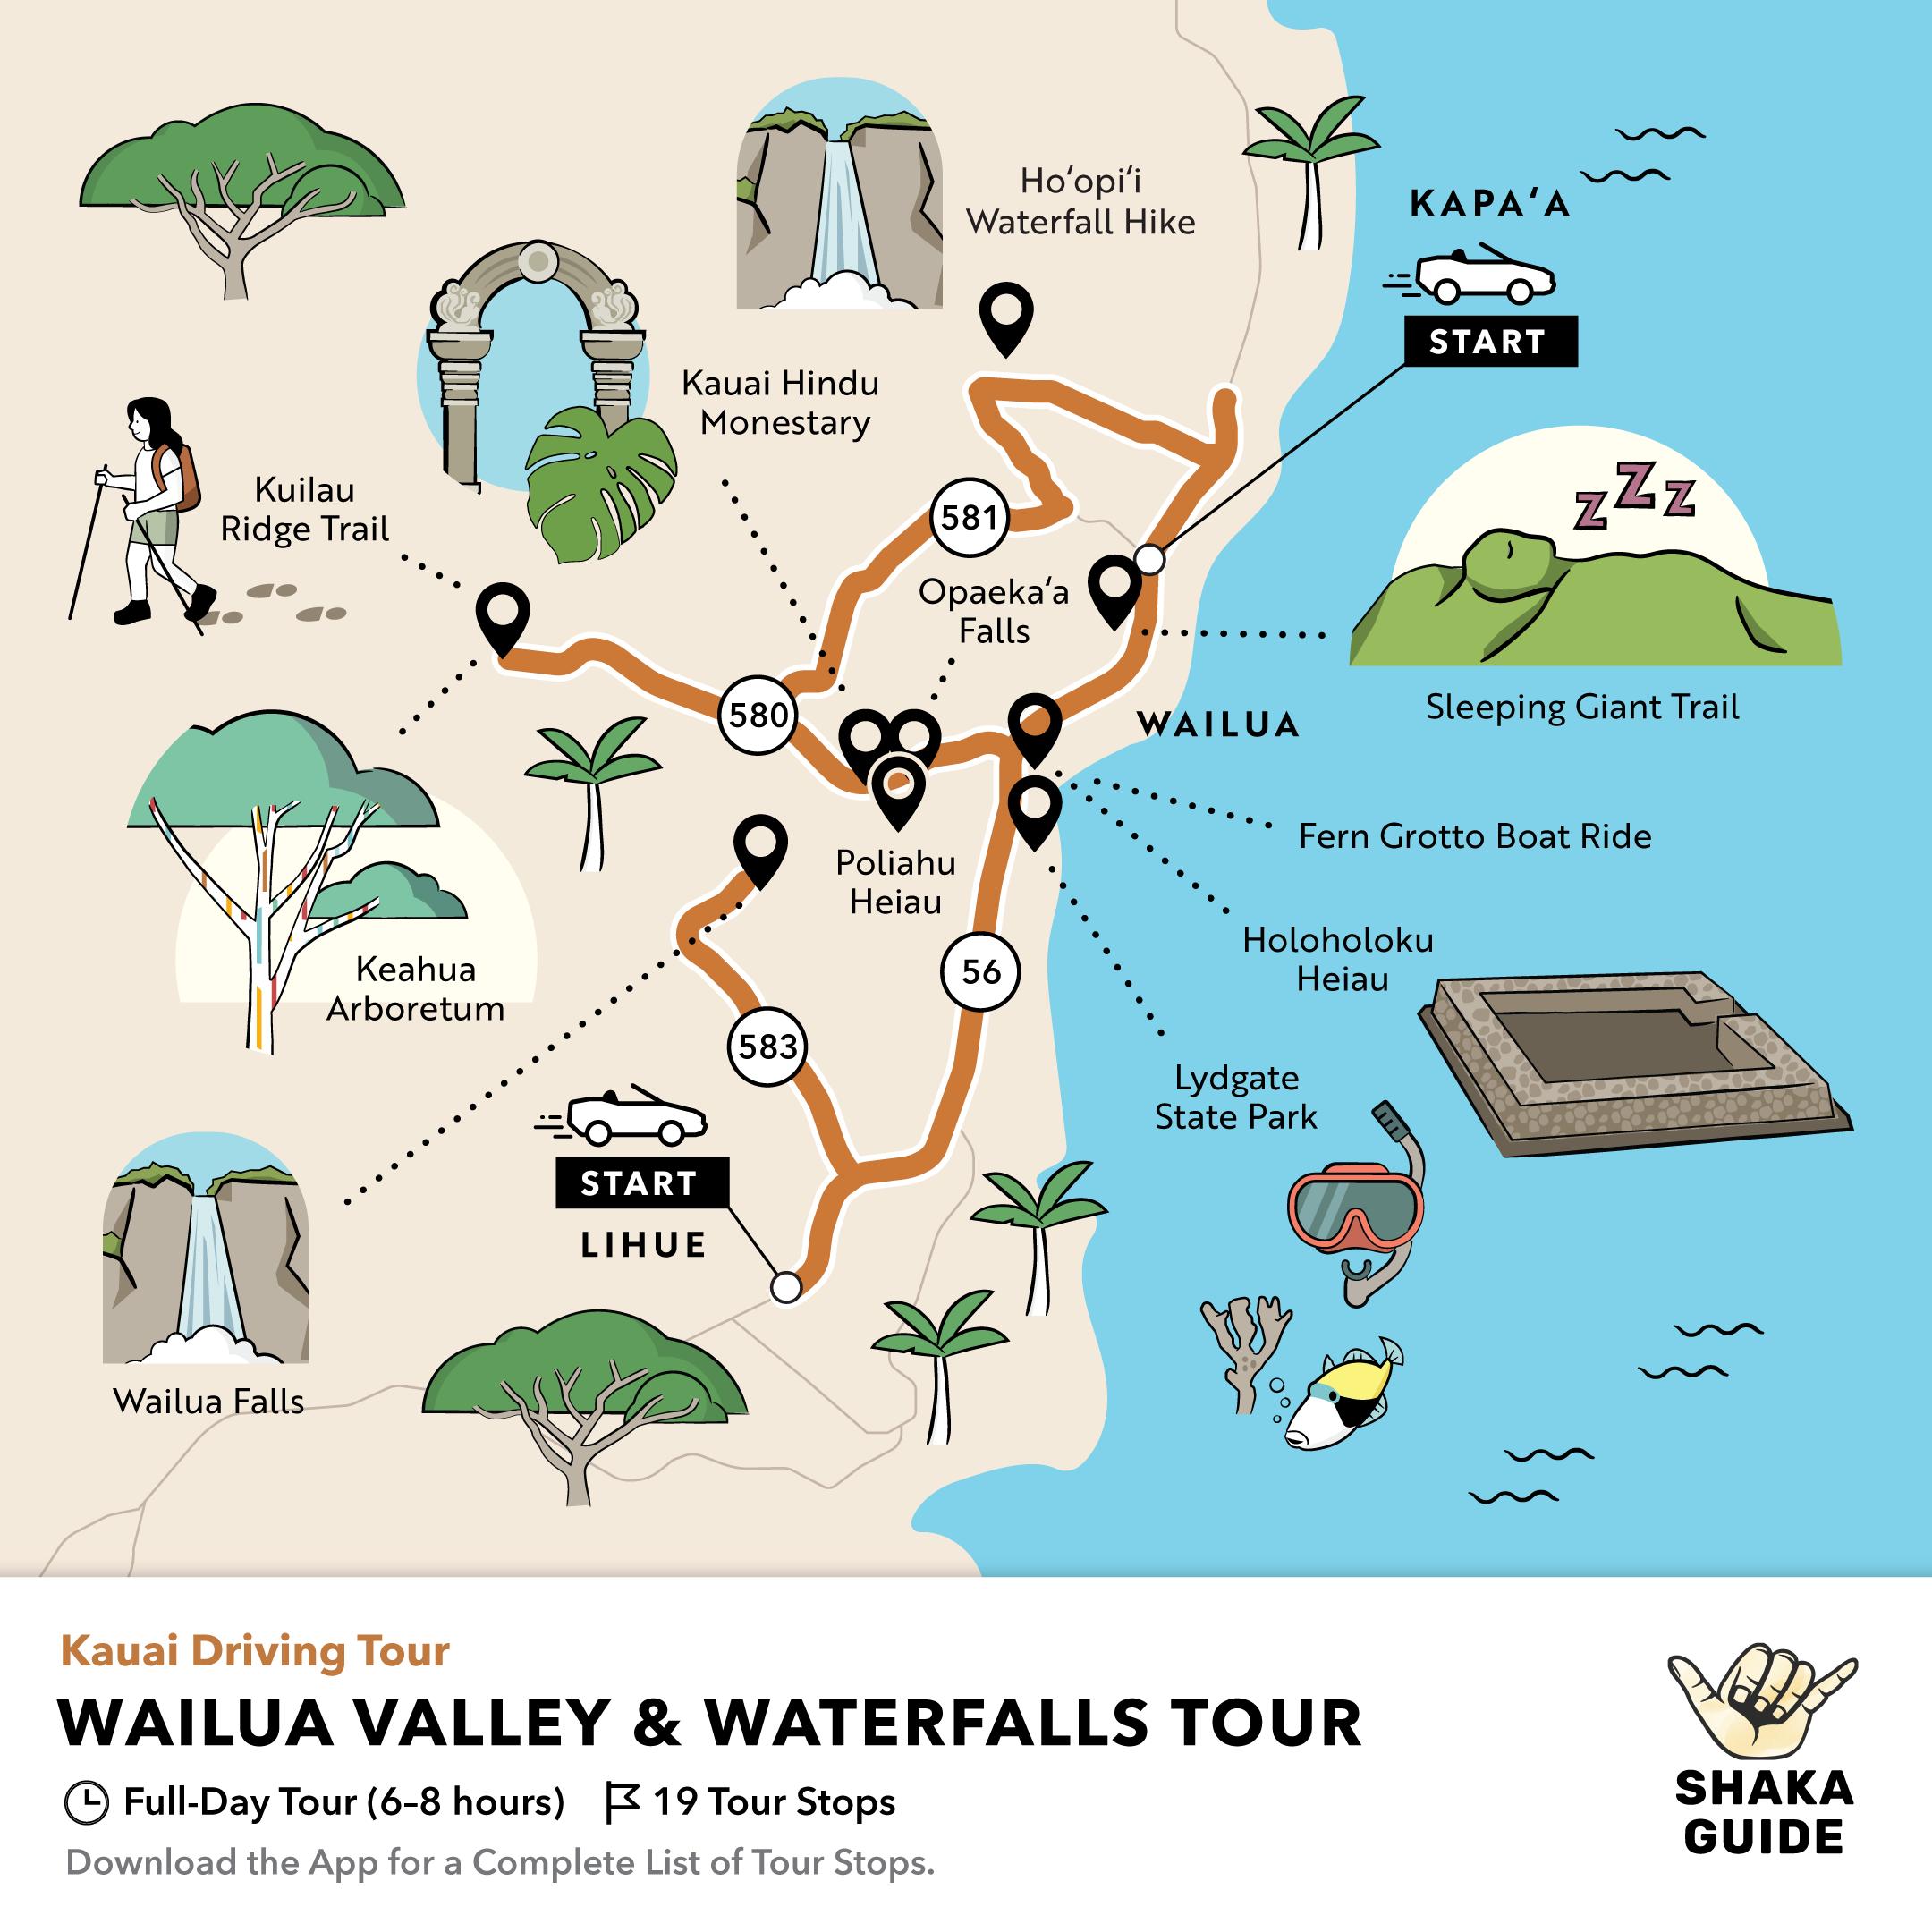 Shaka Guide's Wailua Valley and Waterfalls Tour